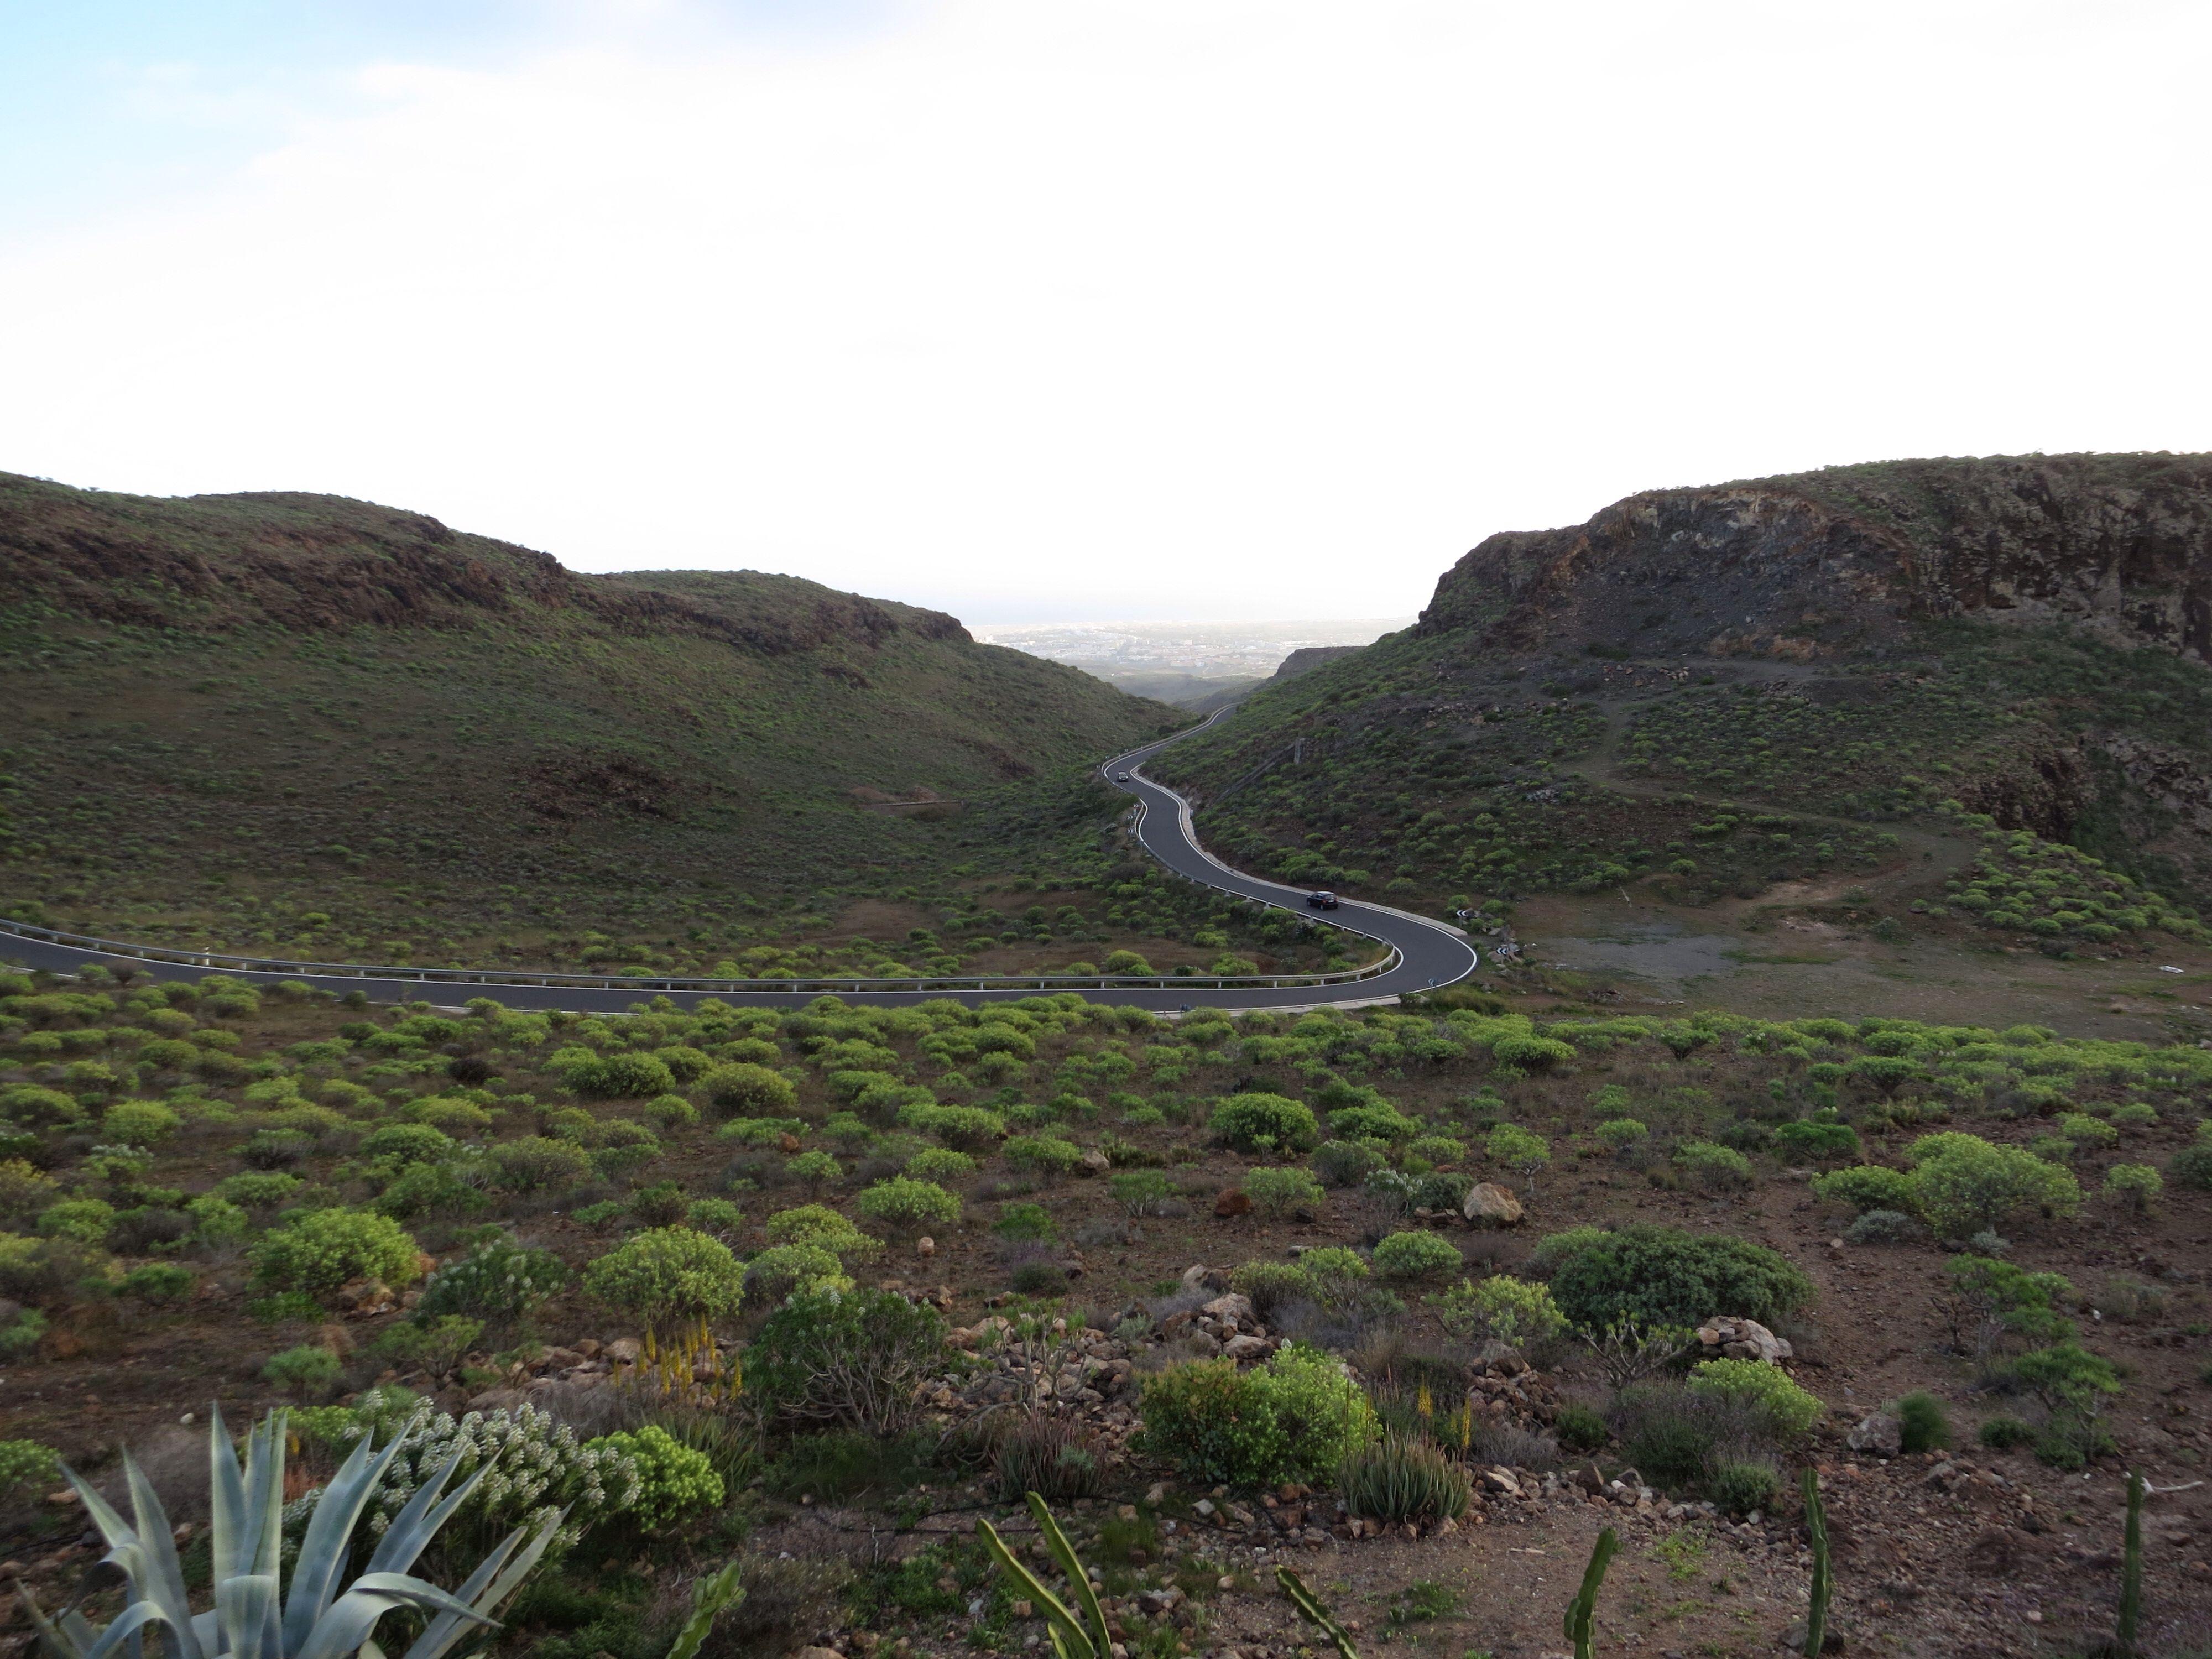 Long and winding road towards the sand dunes of Maspalomas, Gran Canaria